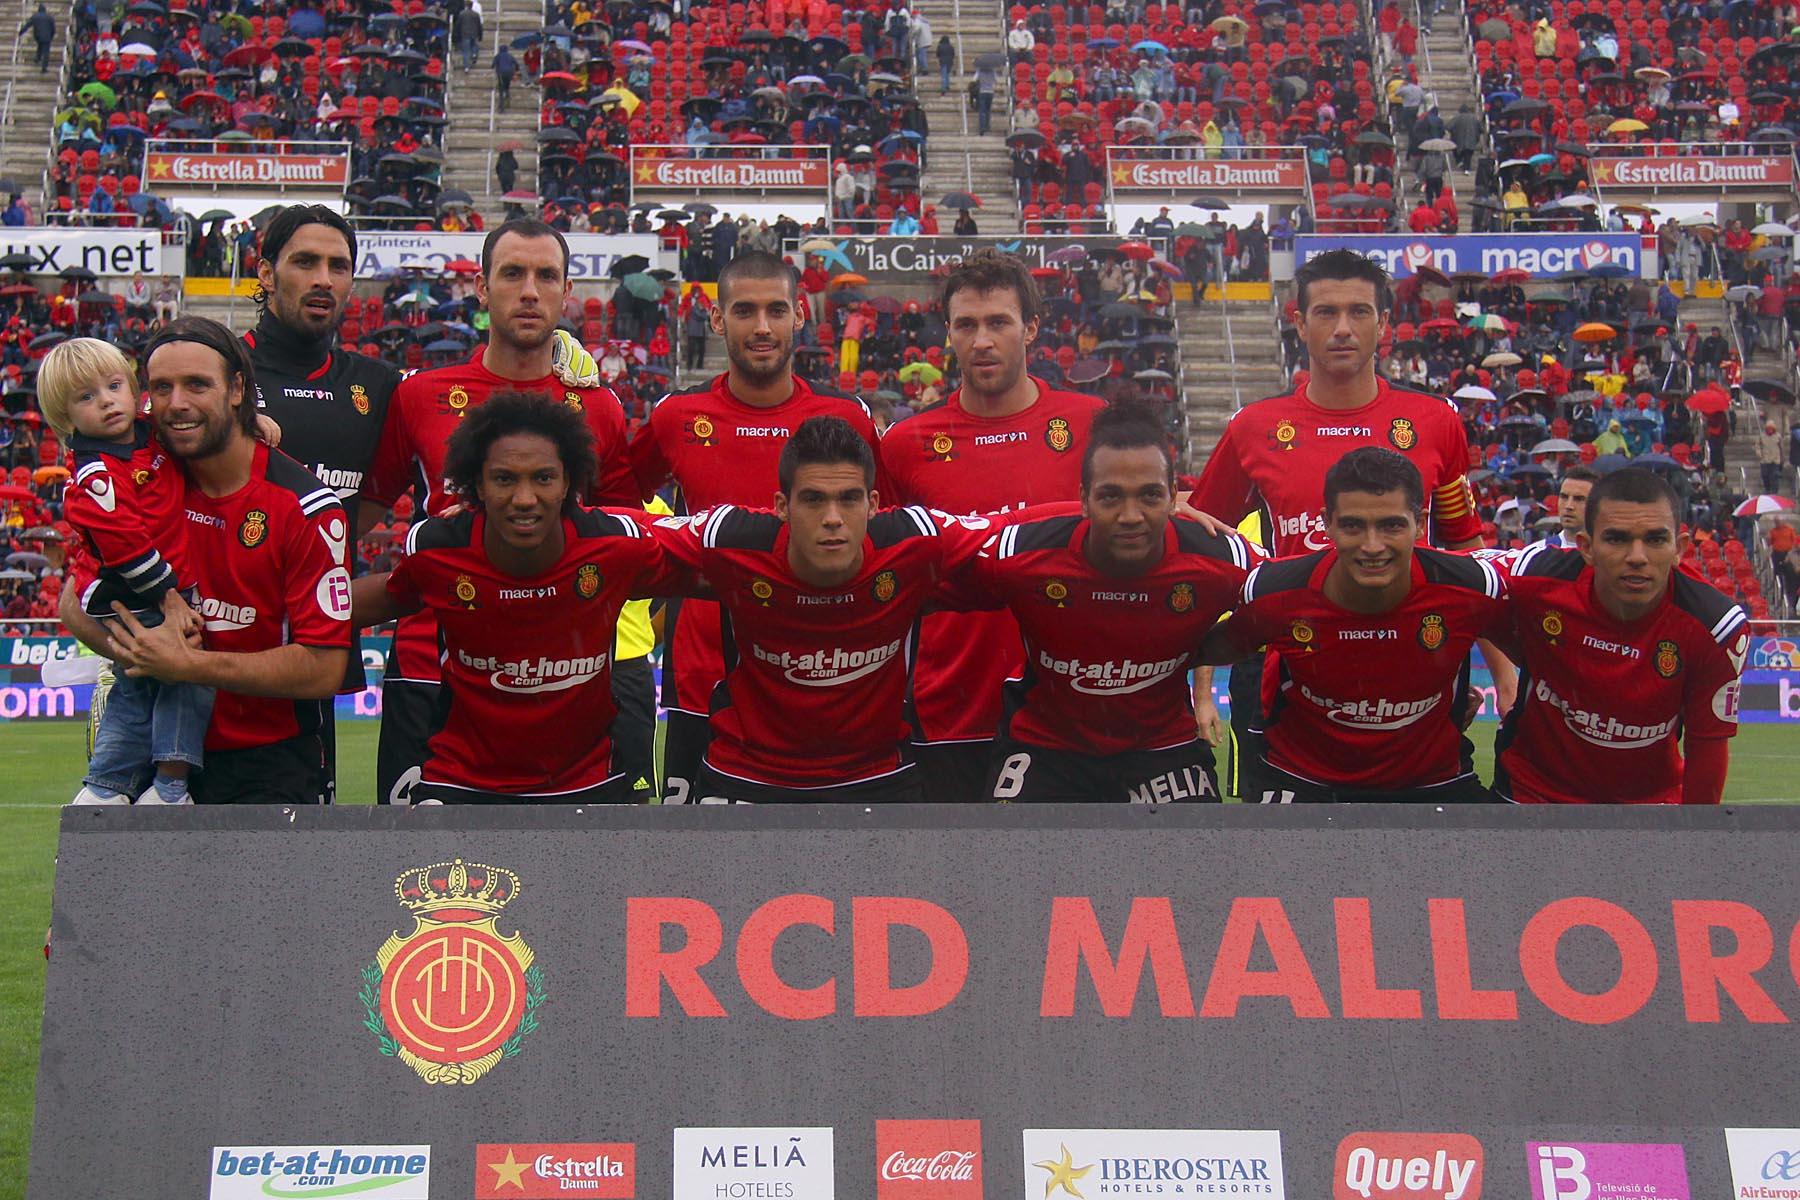 El R.C.D Mallorca suma su primera derrota de la temporada